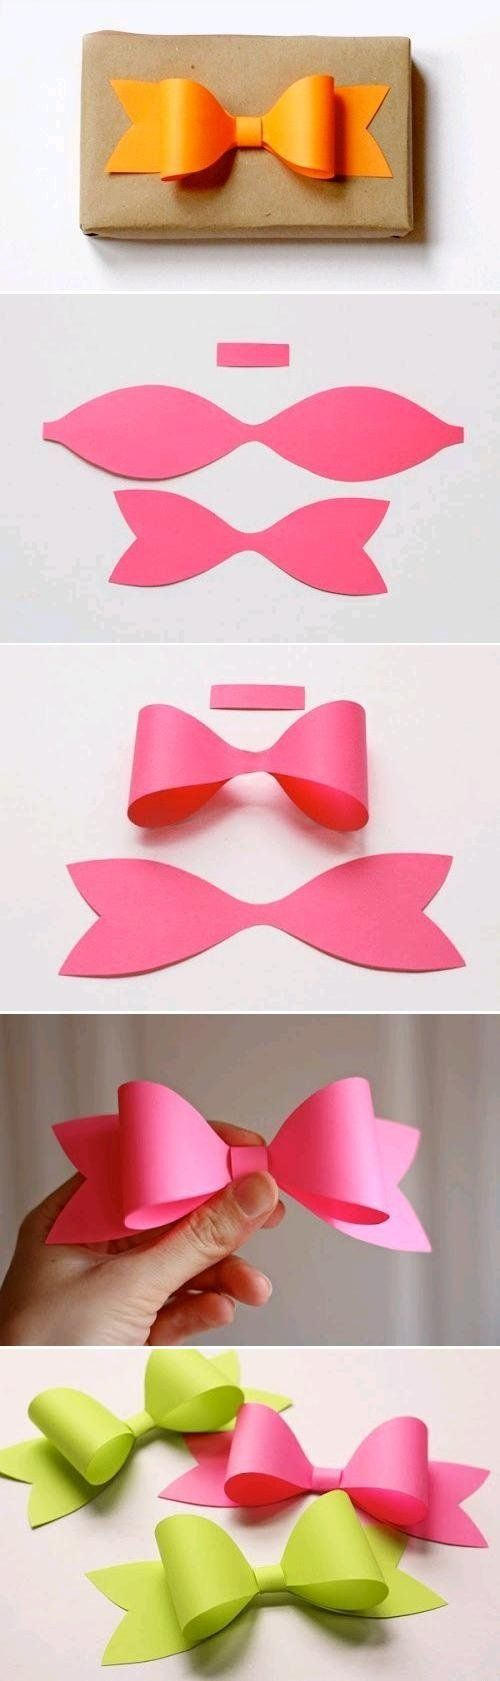 DIY paper bow  | followpics.co